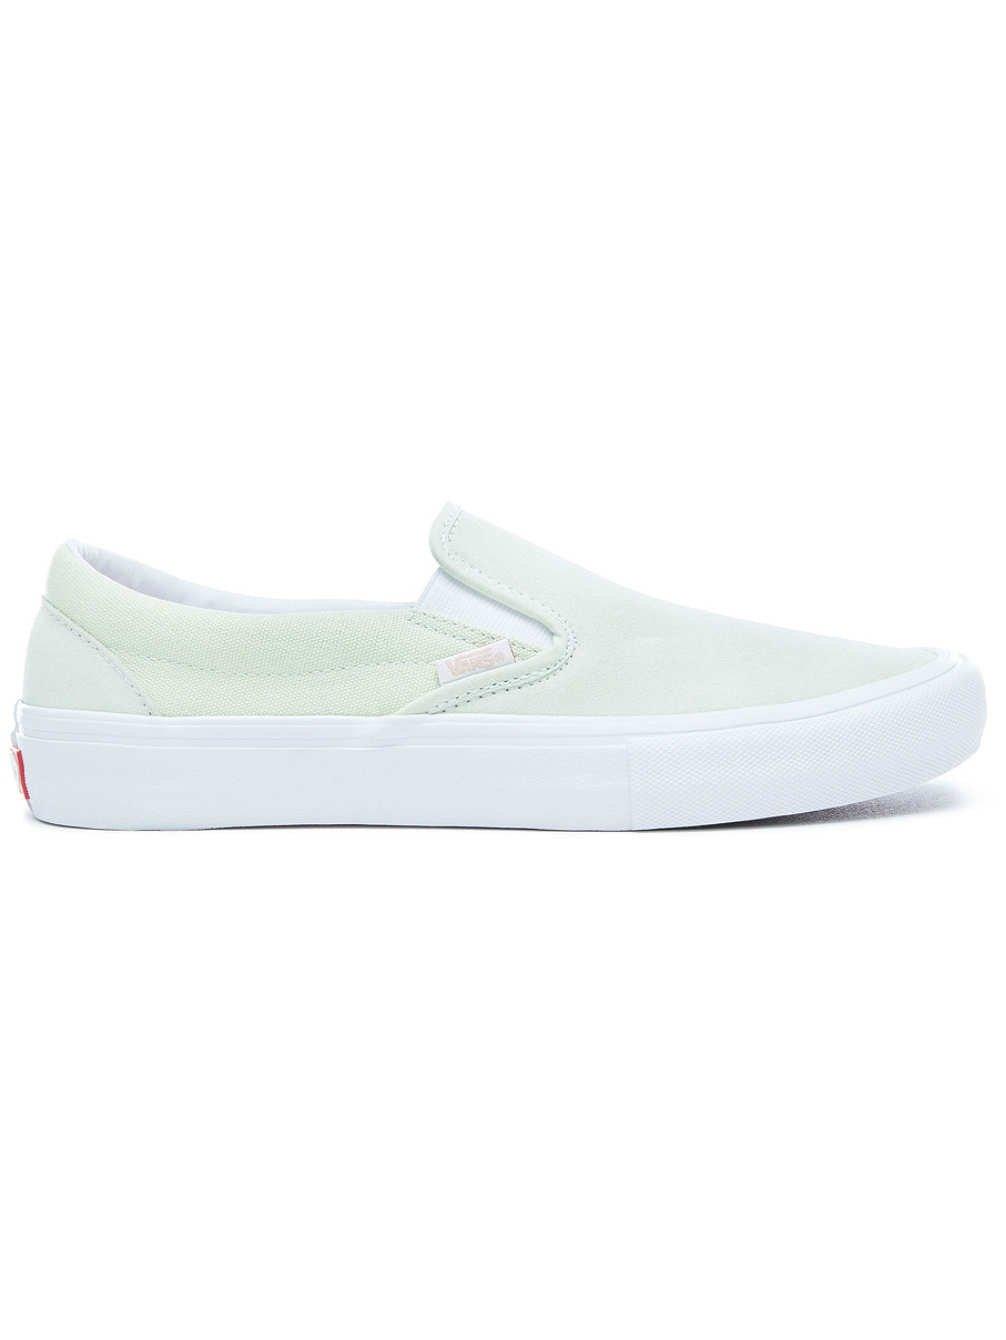 972be6f5658 Galleon - Vans Classic Slip On Ambrosia White Men s Classic Skate Shoes Size  10